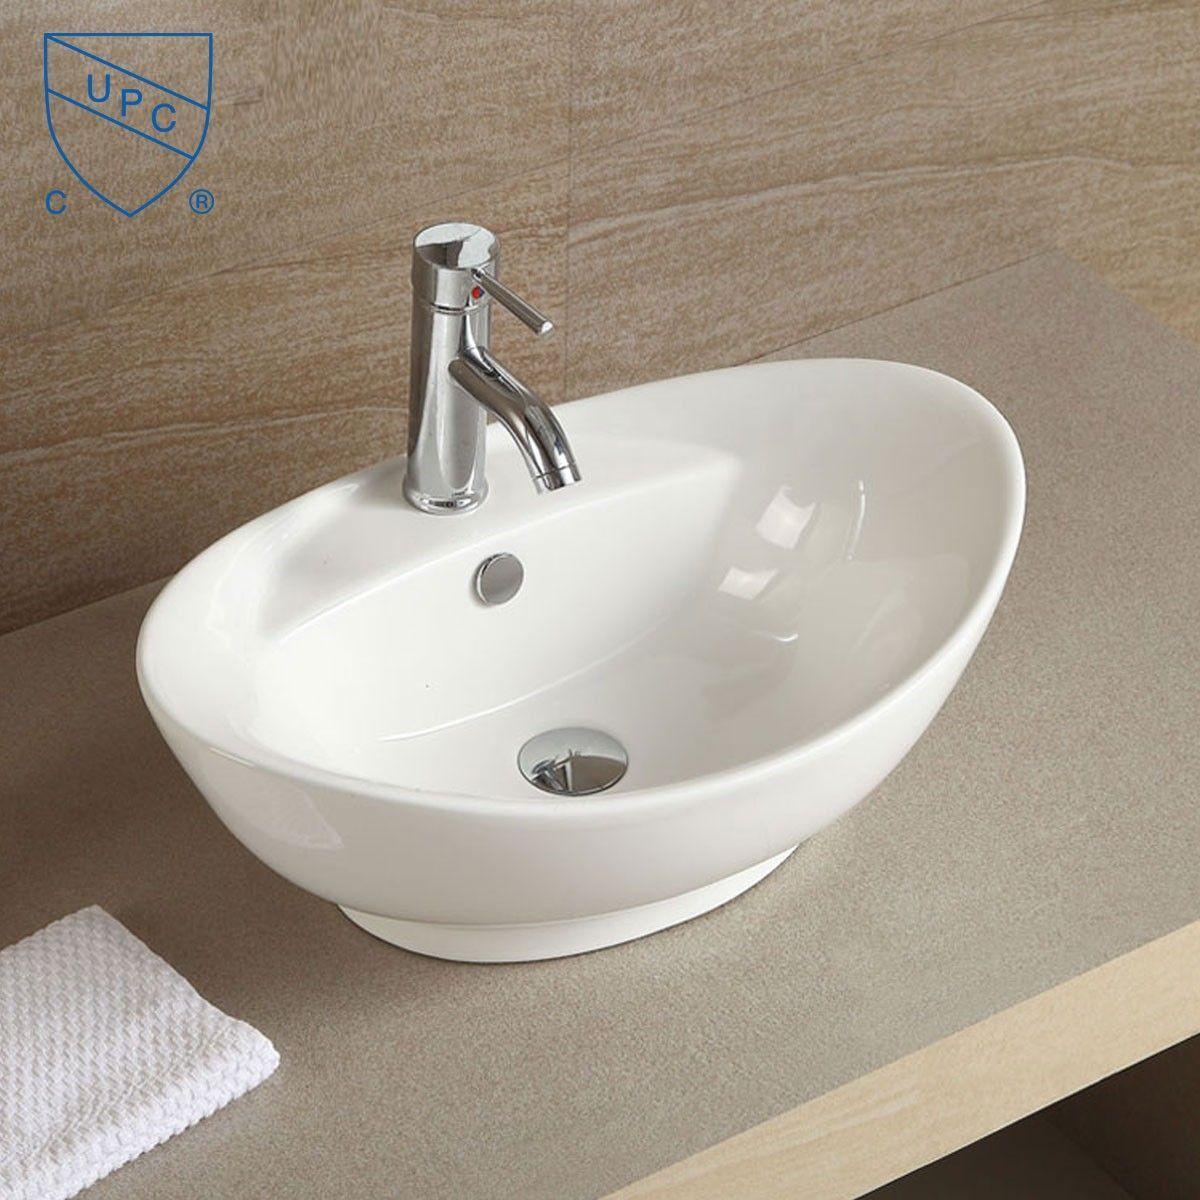 Above Counter Bathroom Sinks Canada. White Oval Ceramic Above Counter Basin Vessel Vanity Sink Art Basin Bathroom Sink